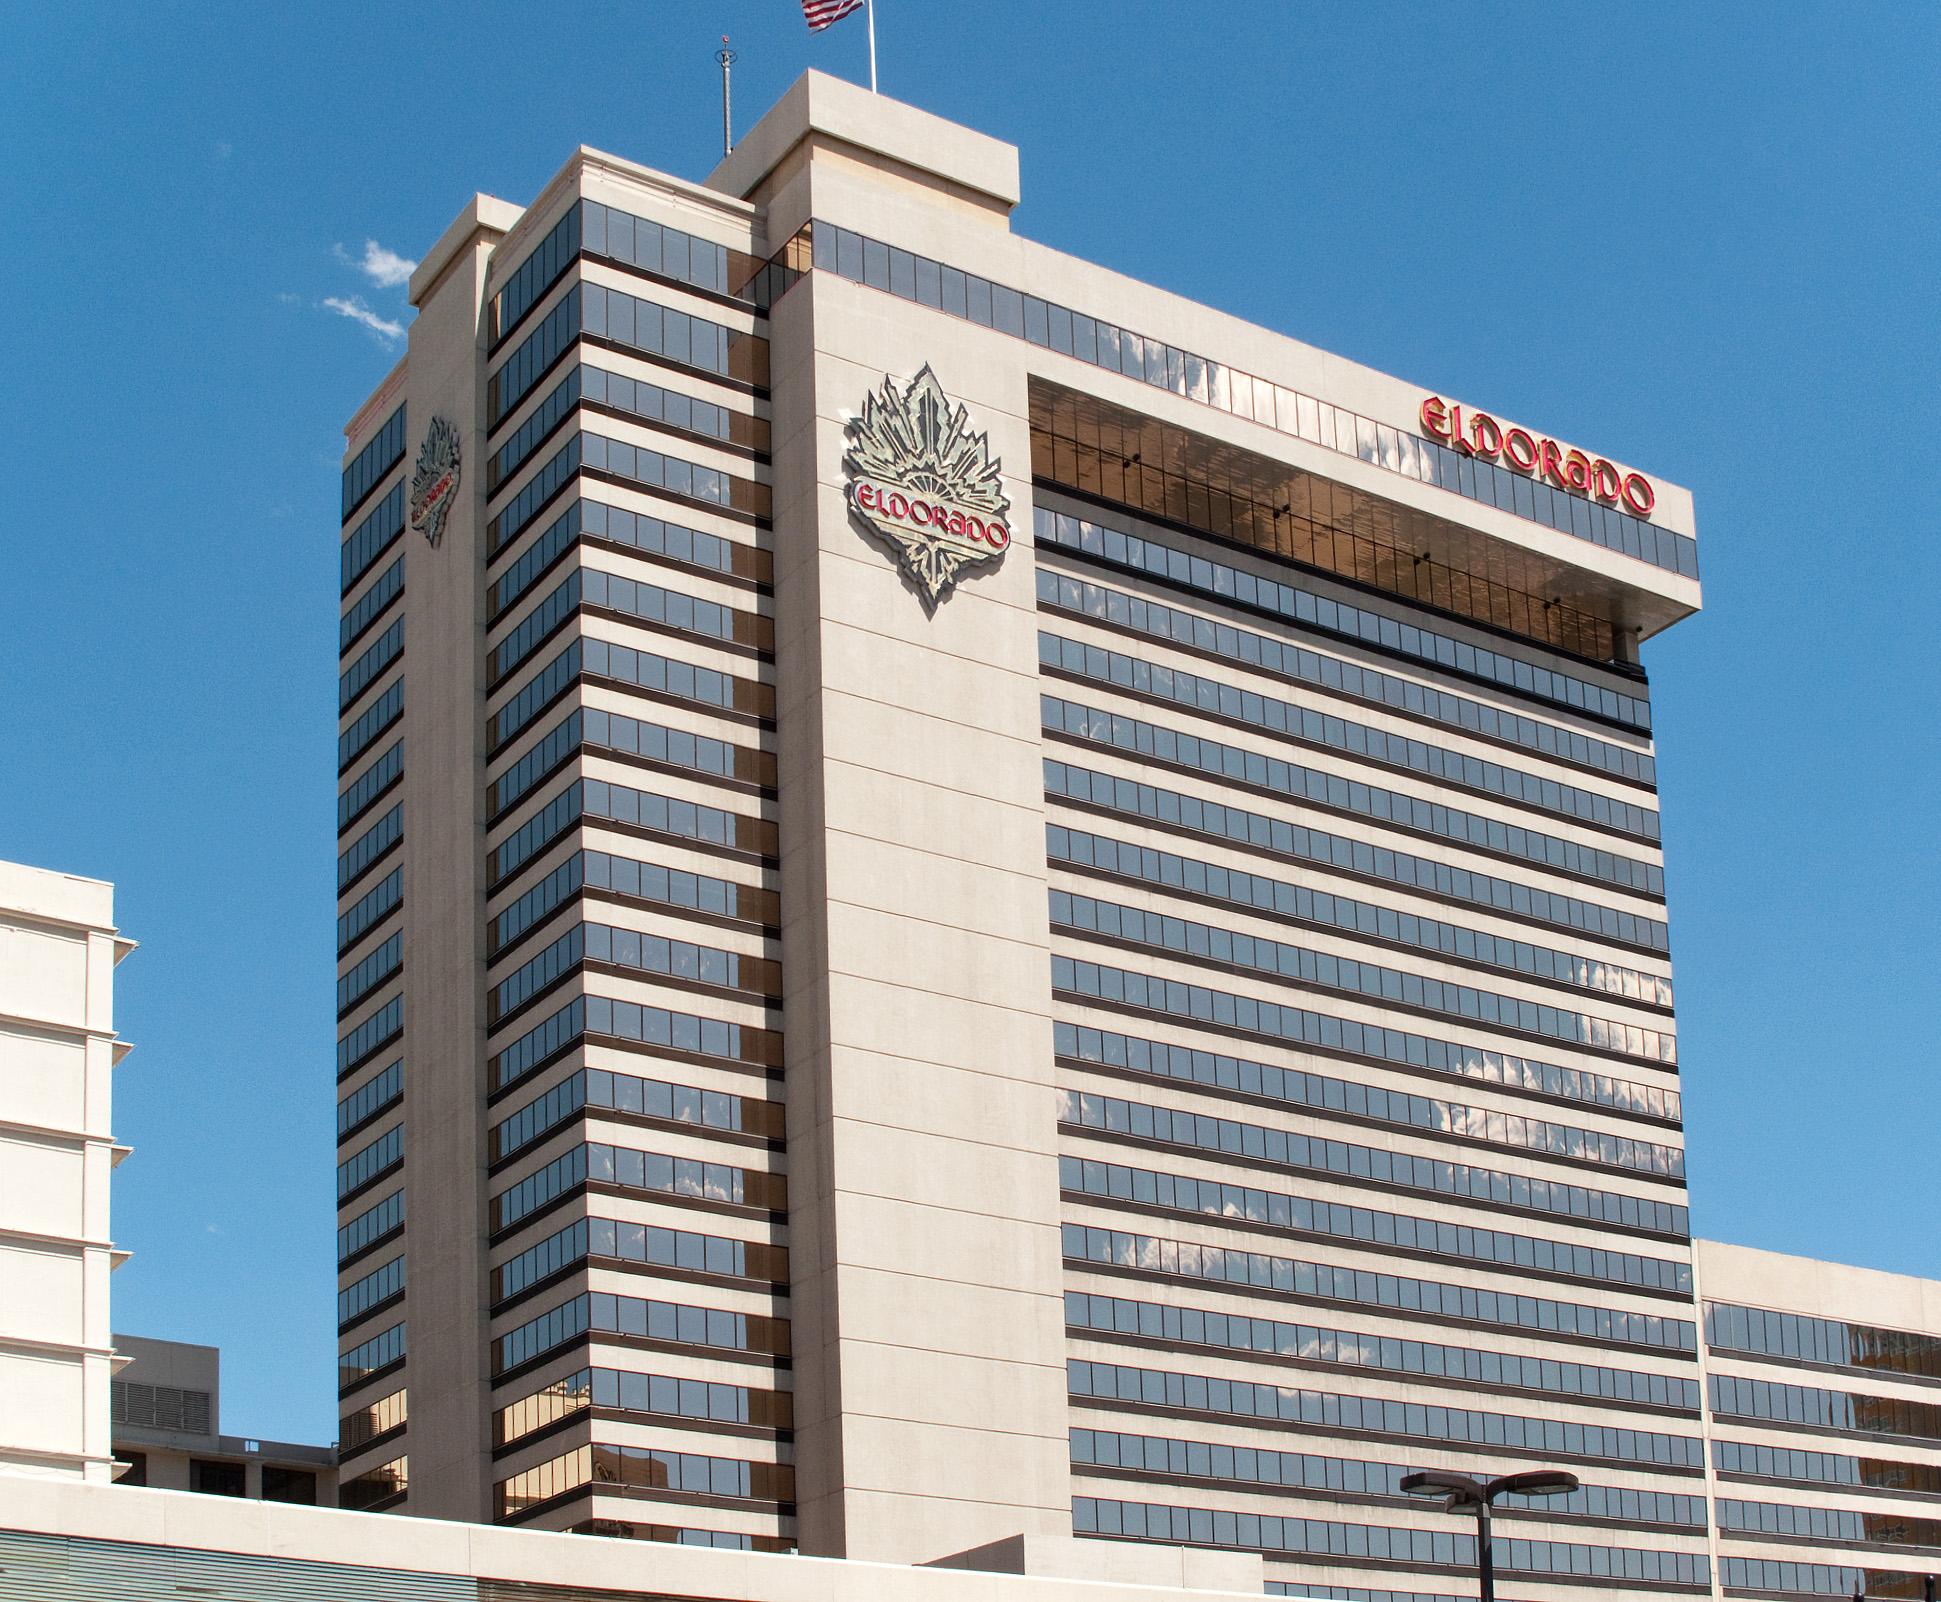 File:Eldorado Hotel Casino, Reno.jpg